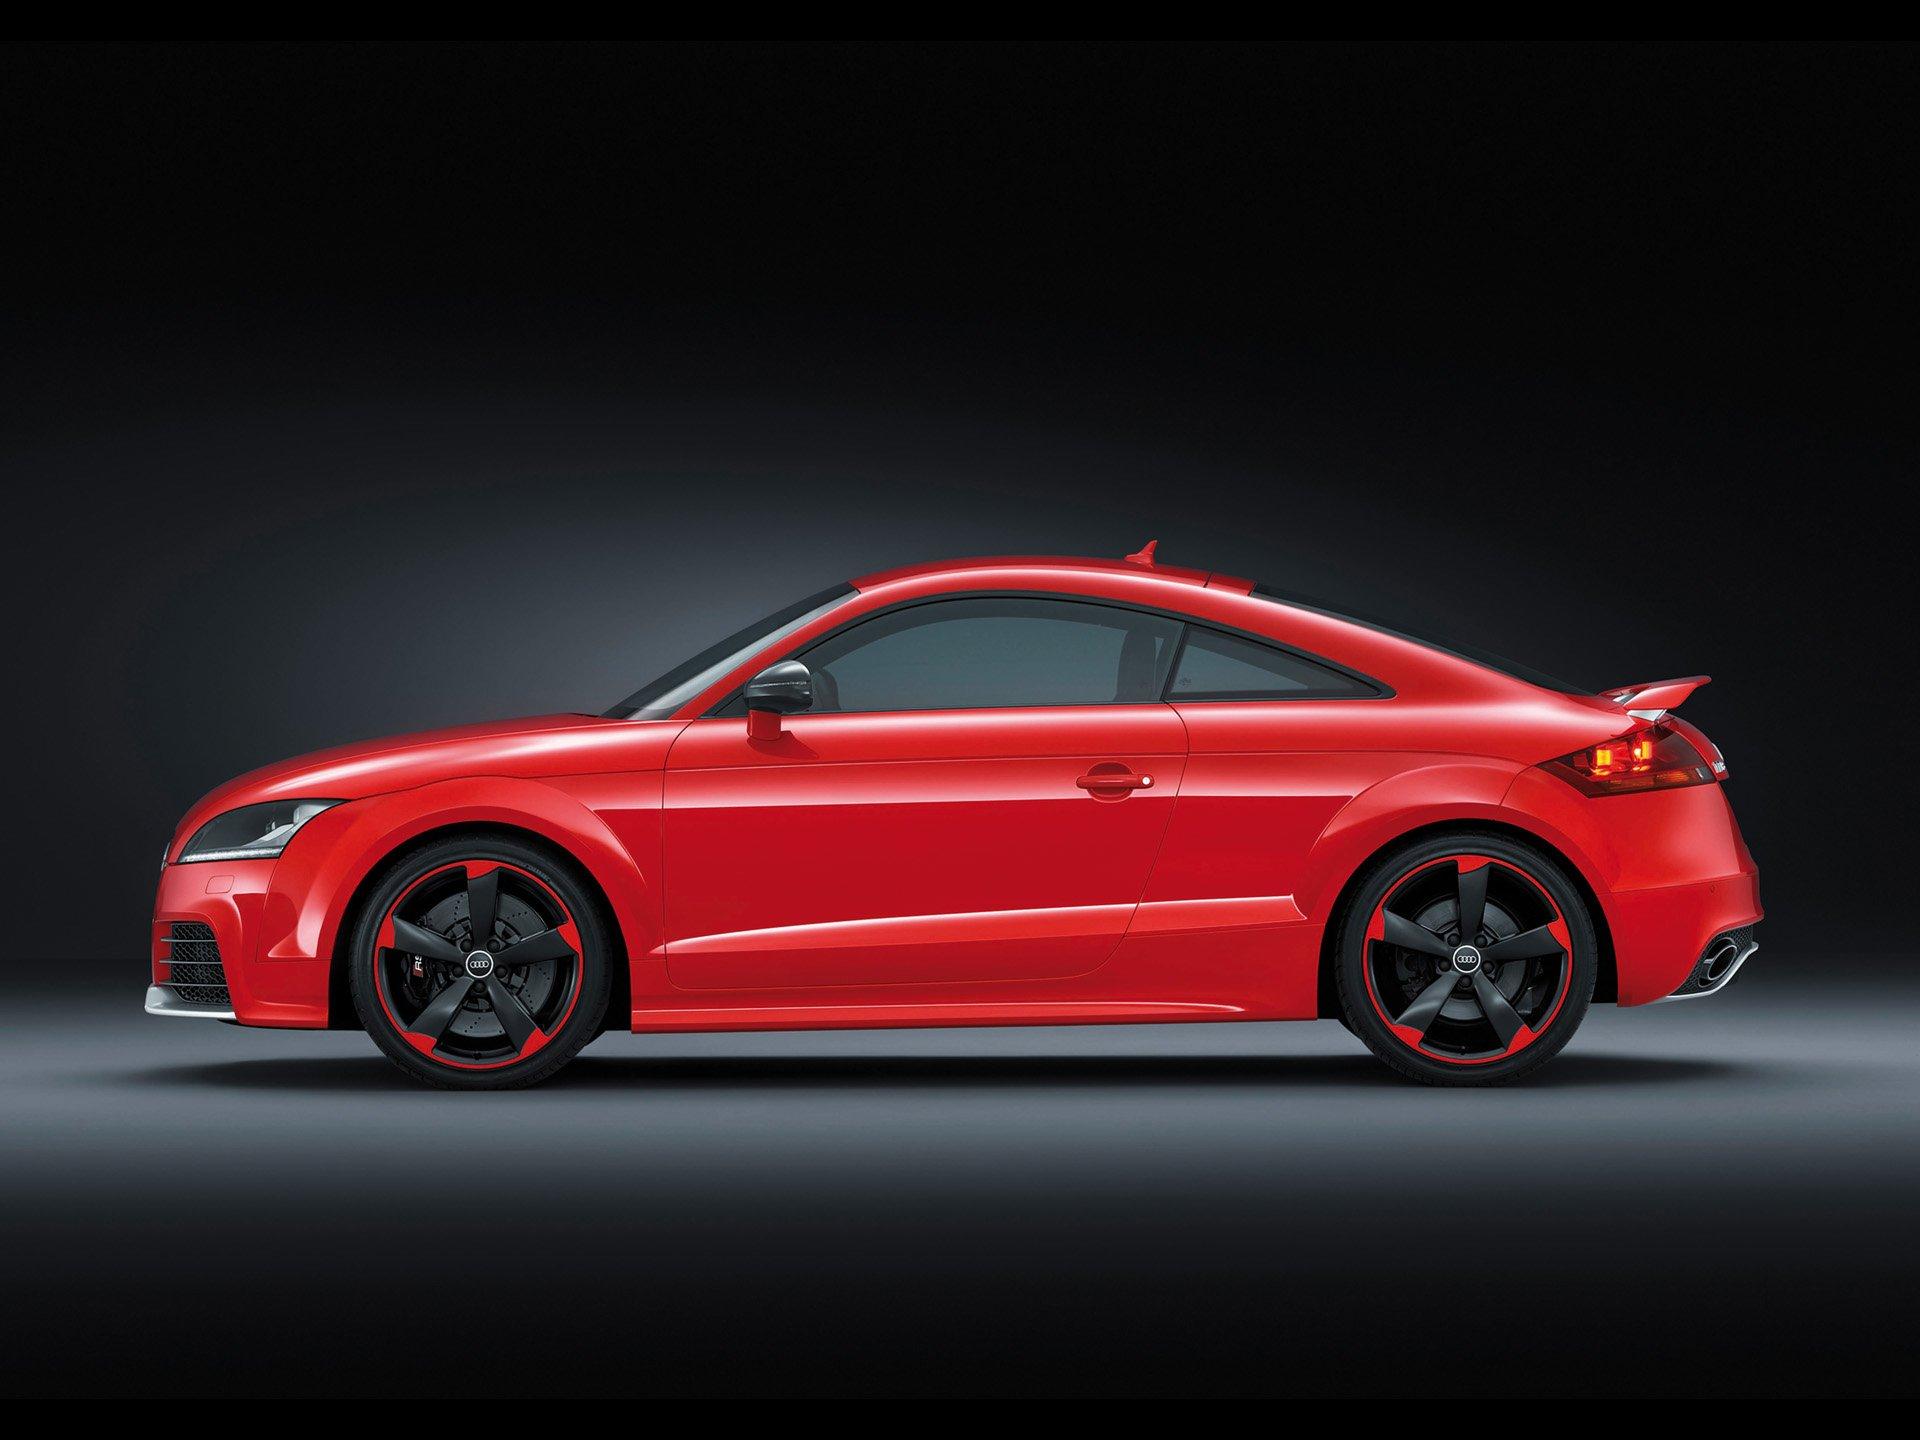 Audi TT RS plus Side wallpapers Audi TT RS plus Side 1920x1440